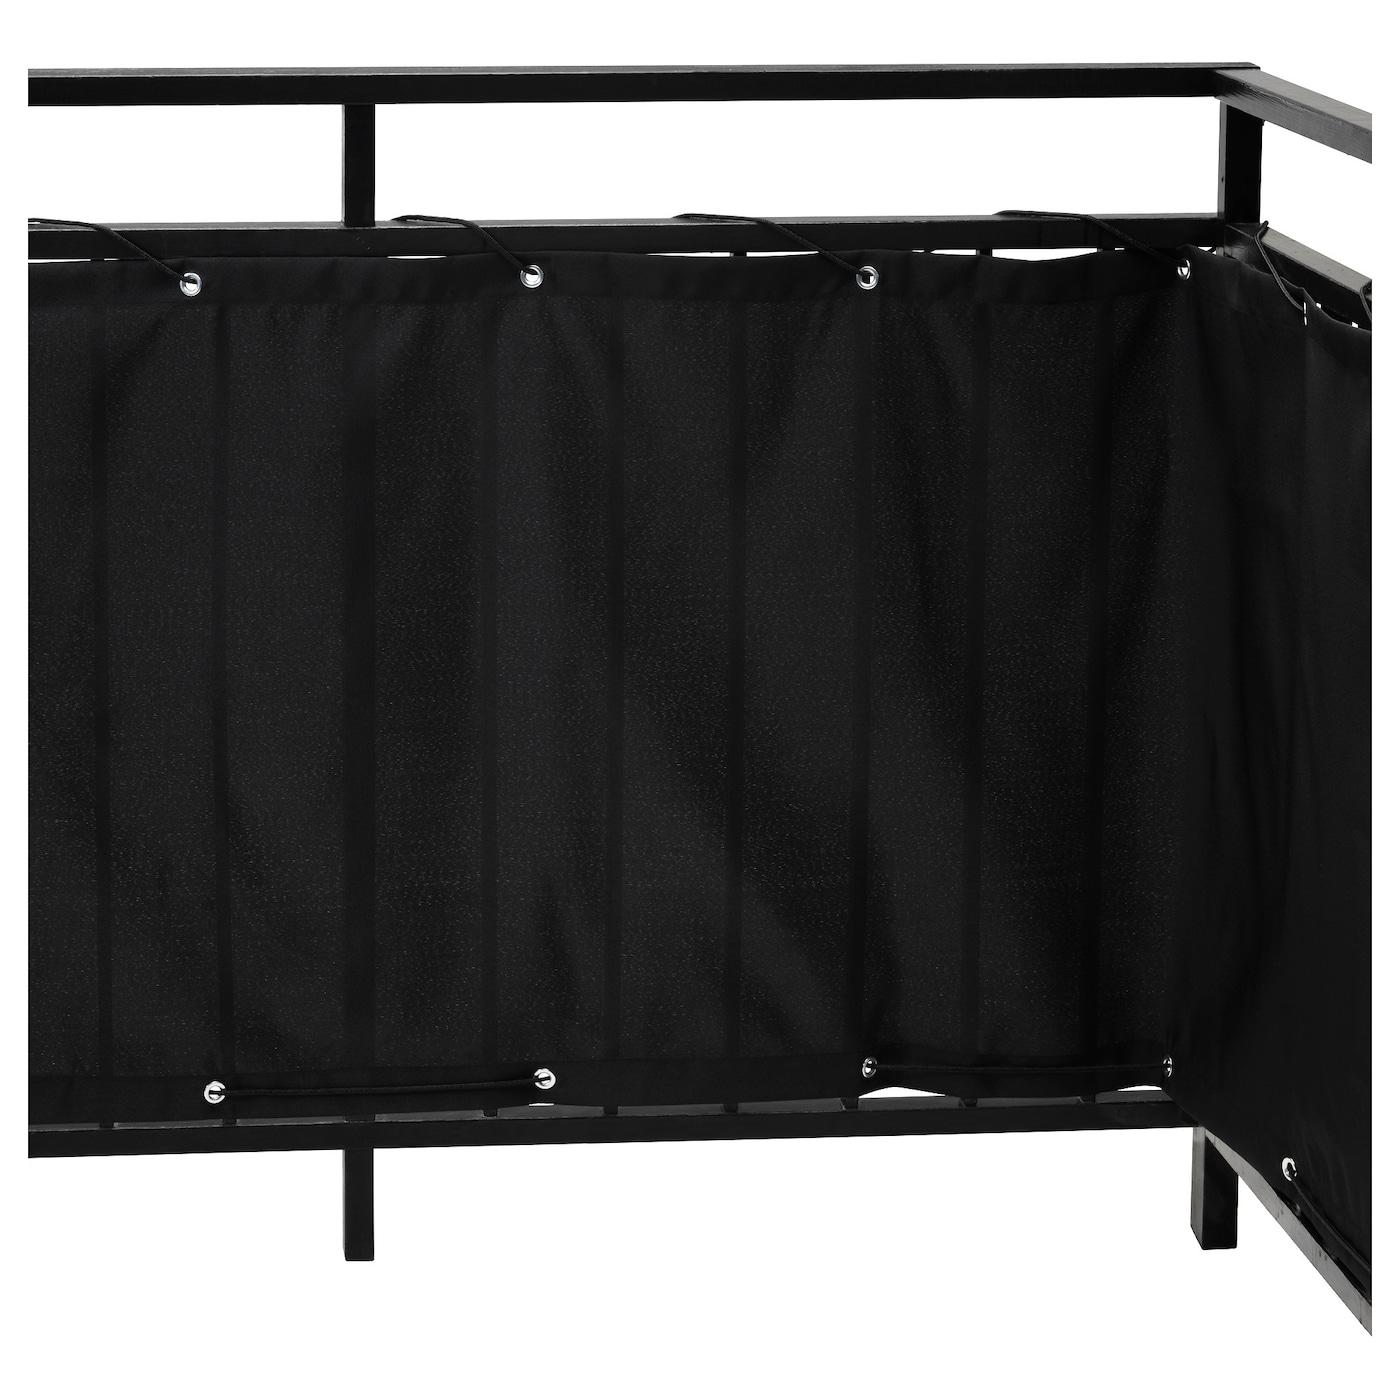 parasols partytenten ikea. Black Bedroom Furniture Sets. Home Design Ideas